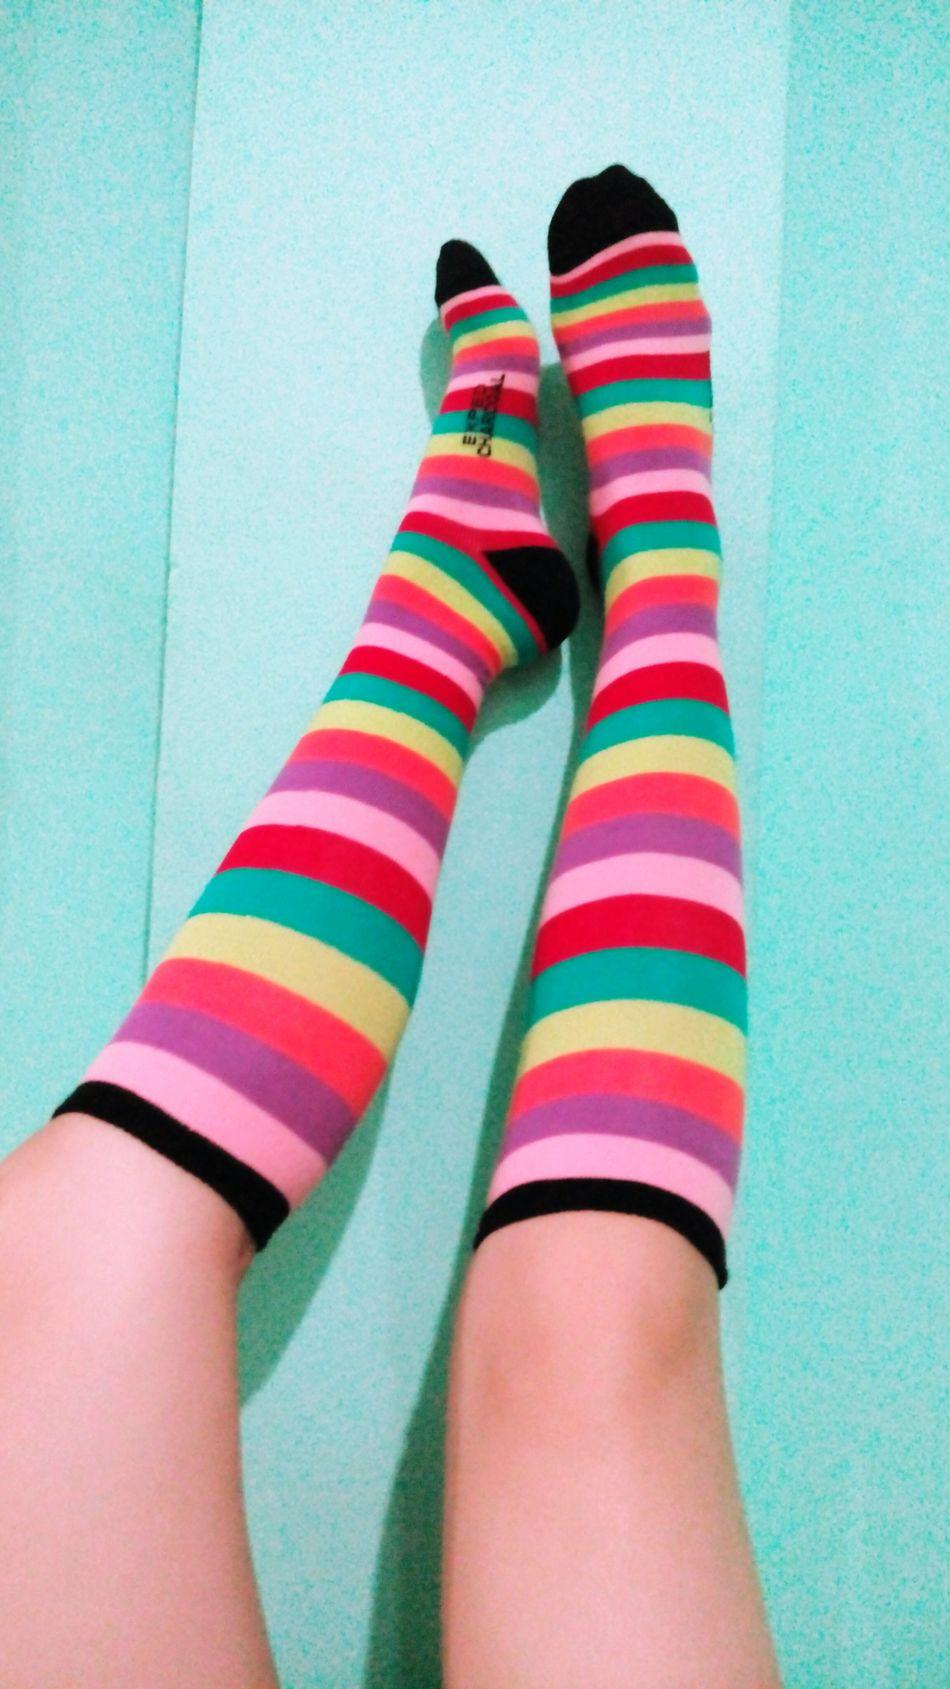 Legs Legs Up Socks Colorful Art Creativity Colorful Socks Model Type Photography Camera Phone Long Legs